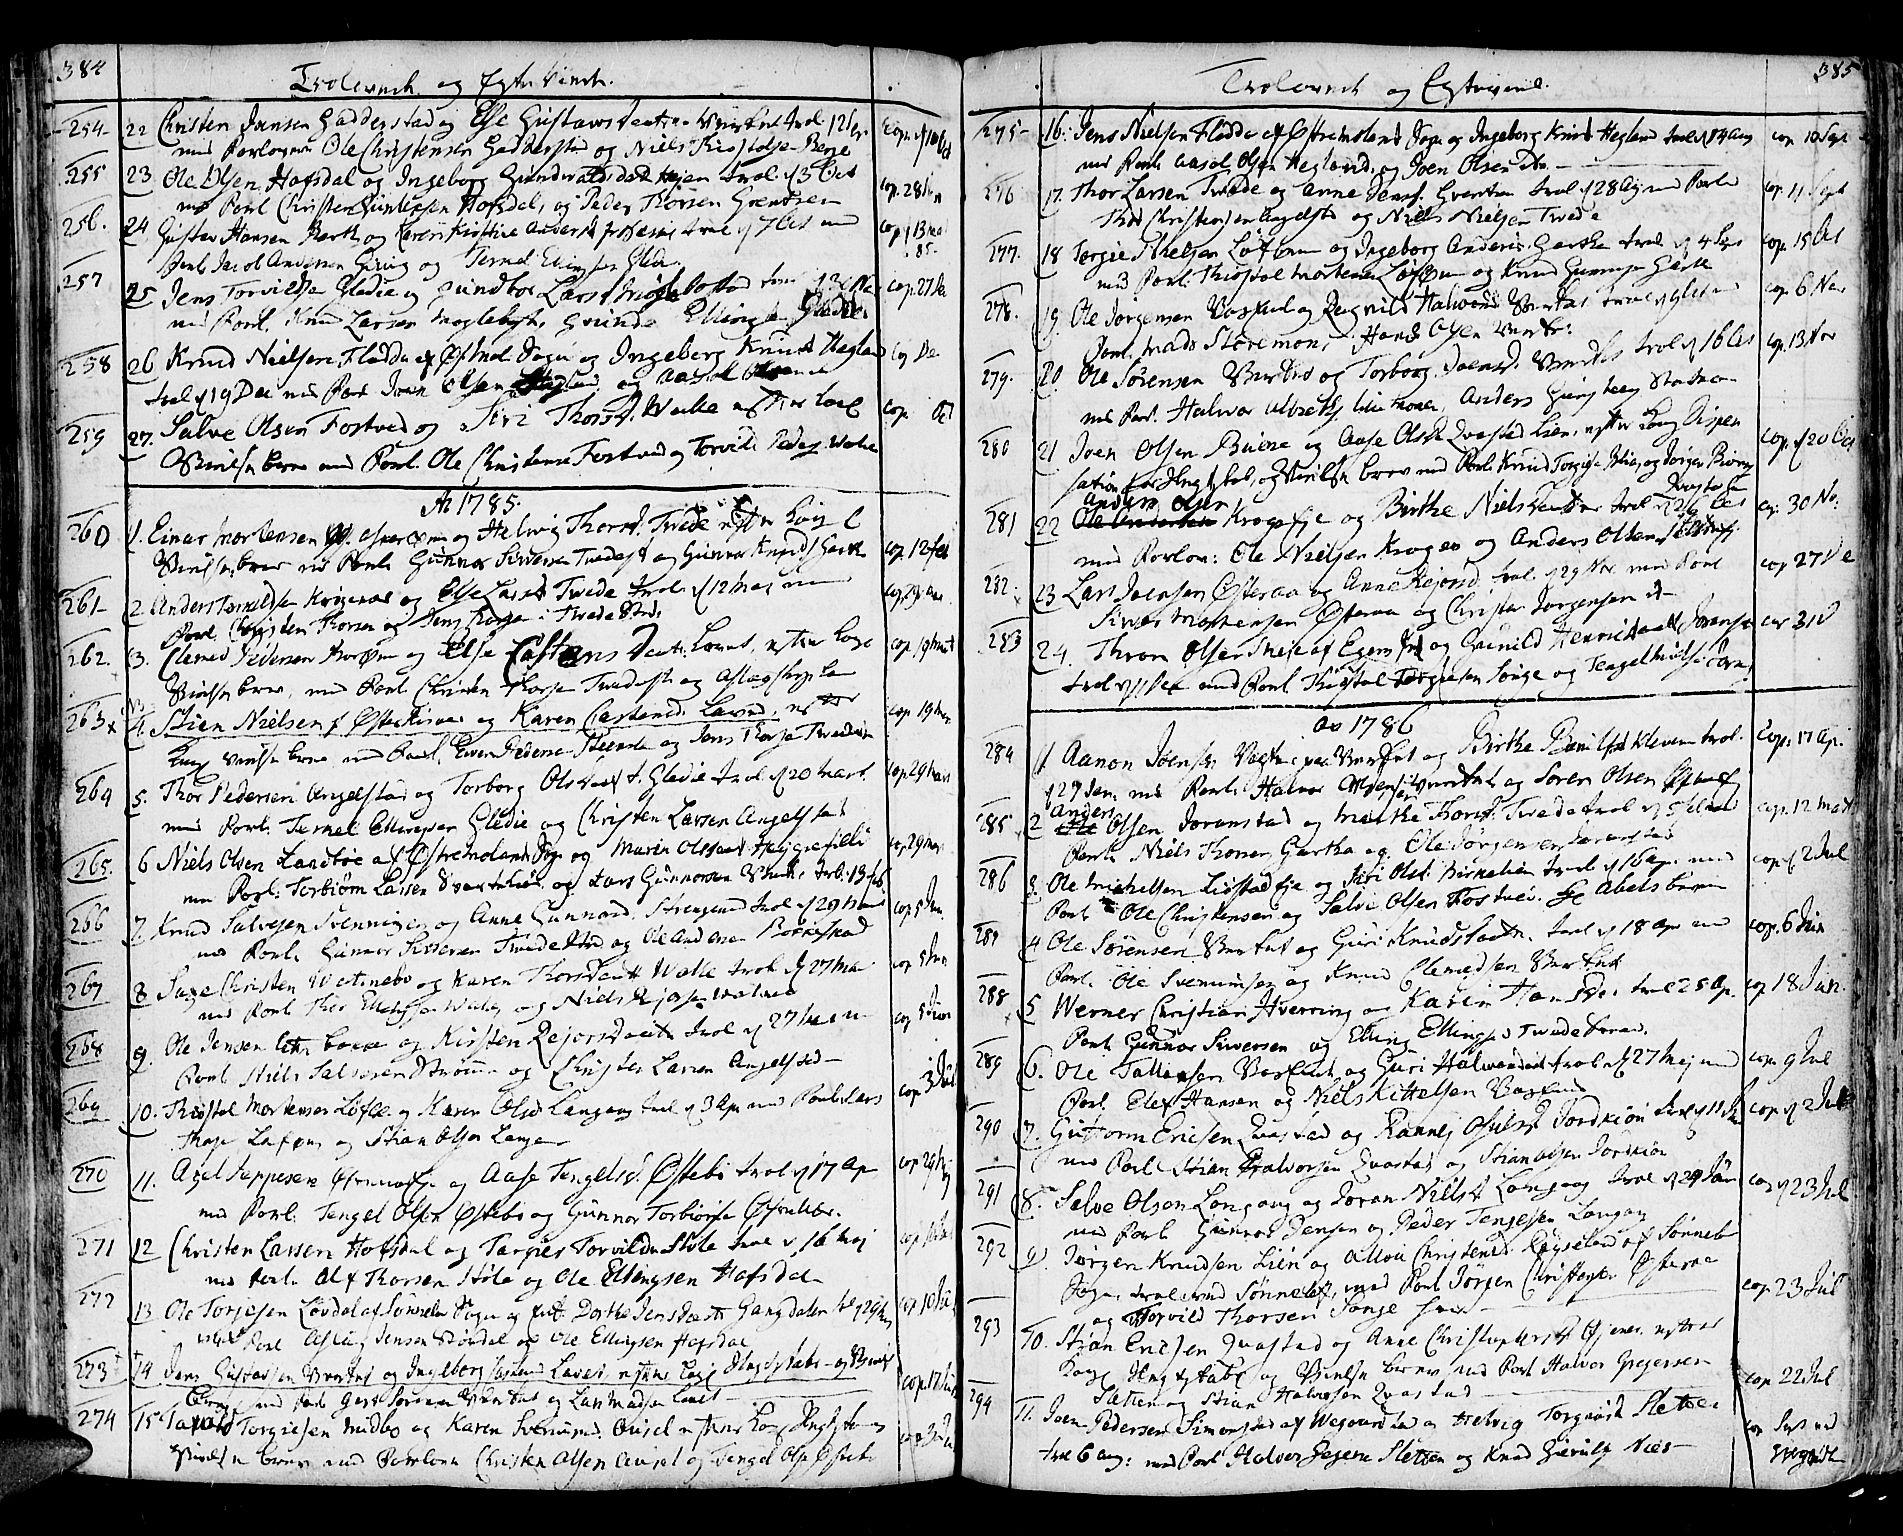 SAK, Holt sokneprestkontor, F/Fa/L0003: Ministerialbok nr. A 3, 1765-1798, s. 384-385